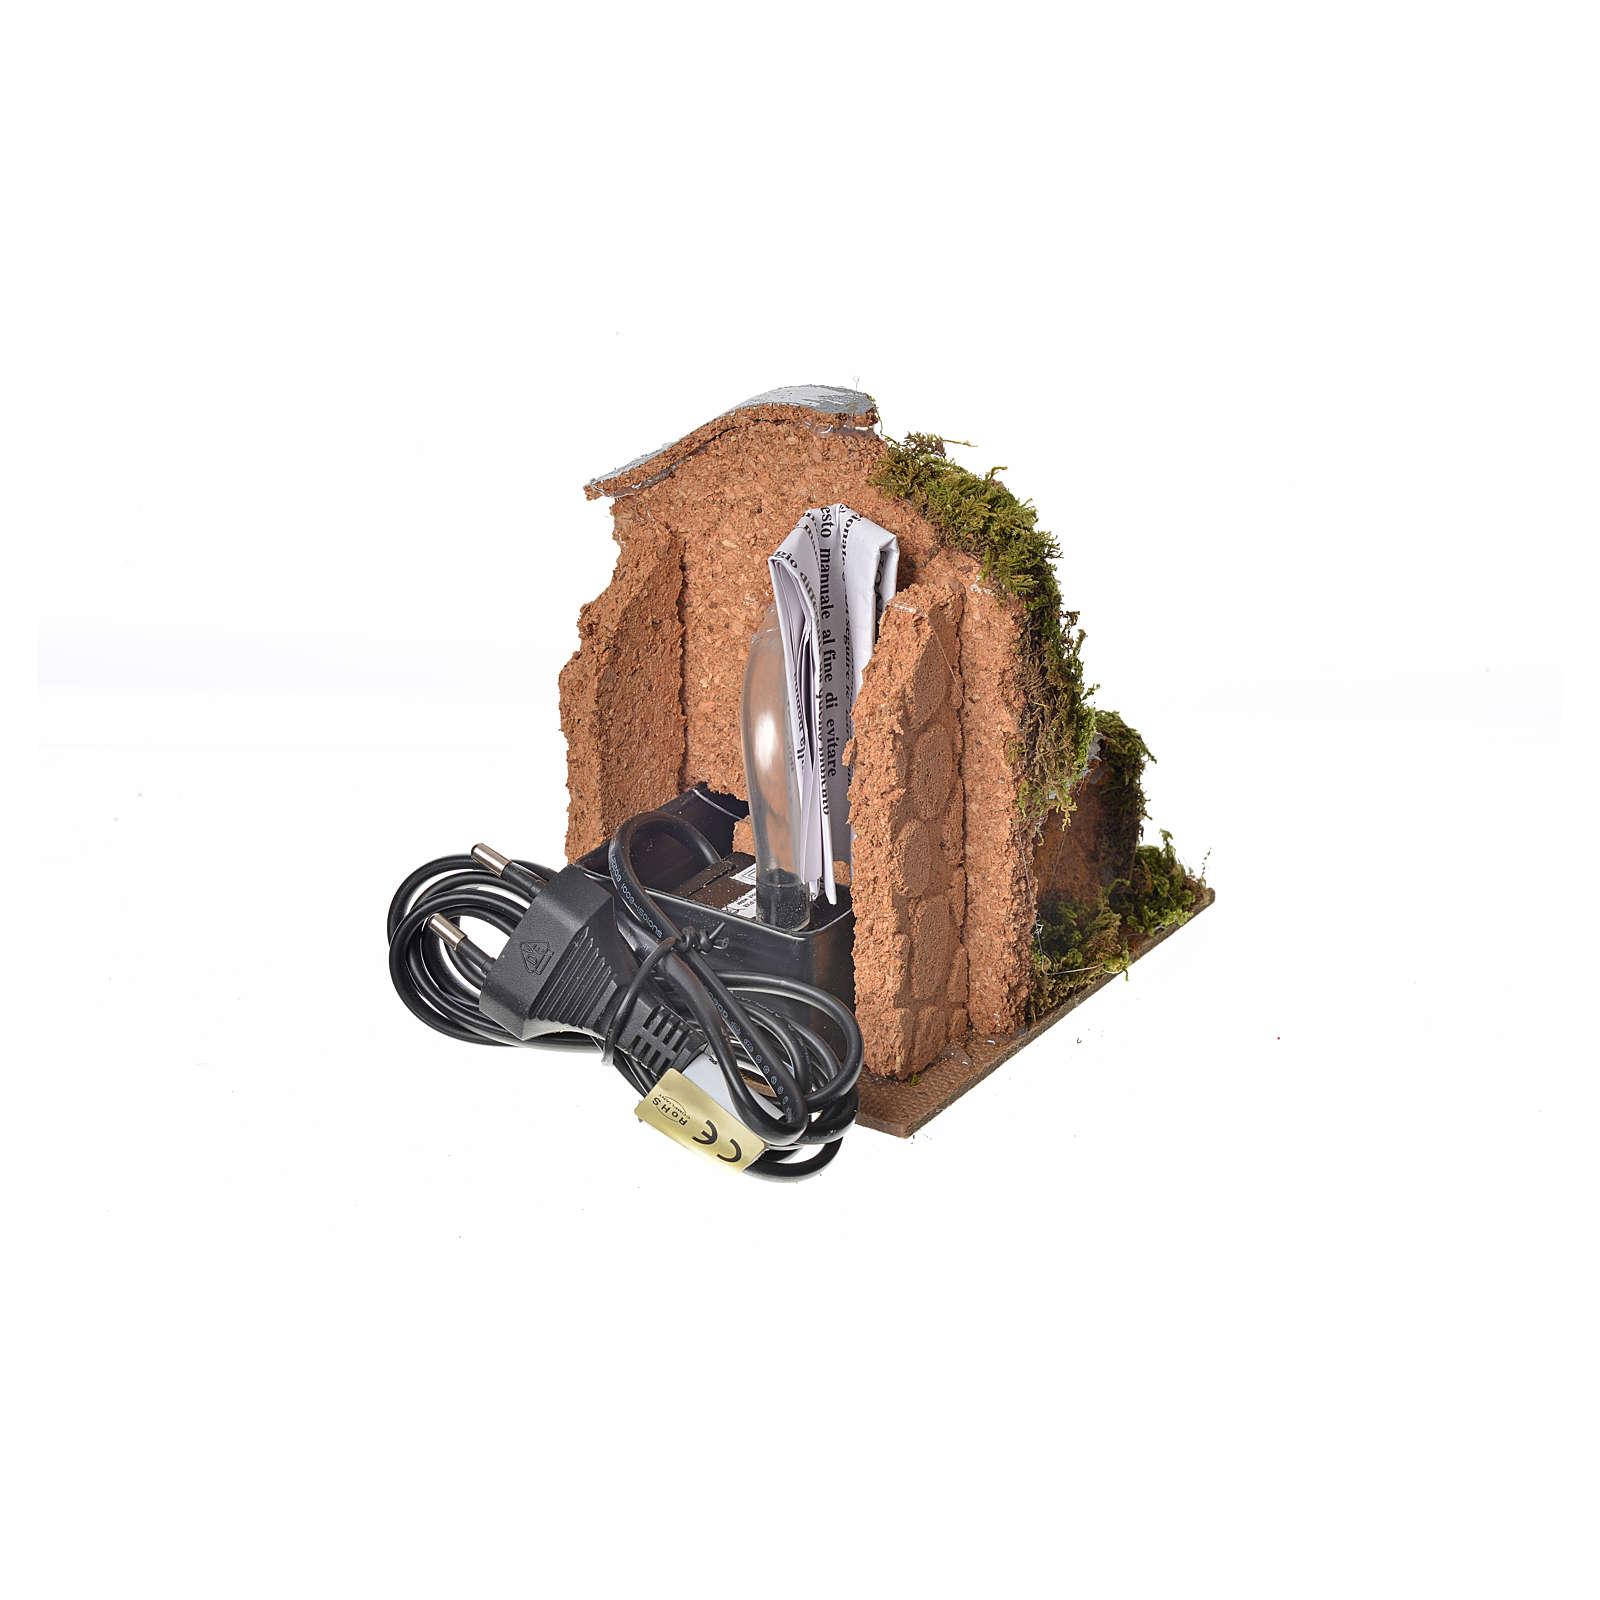 Fontana con pompa riciclo 13x10x13 4